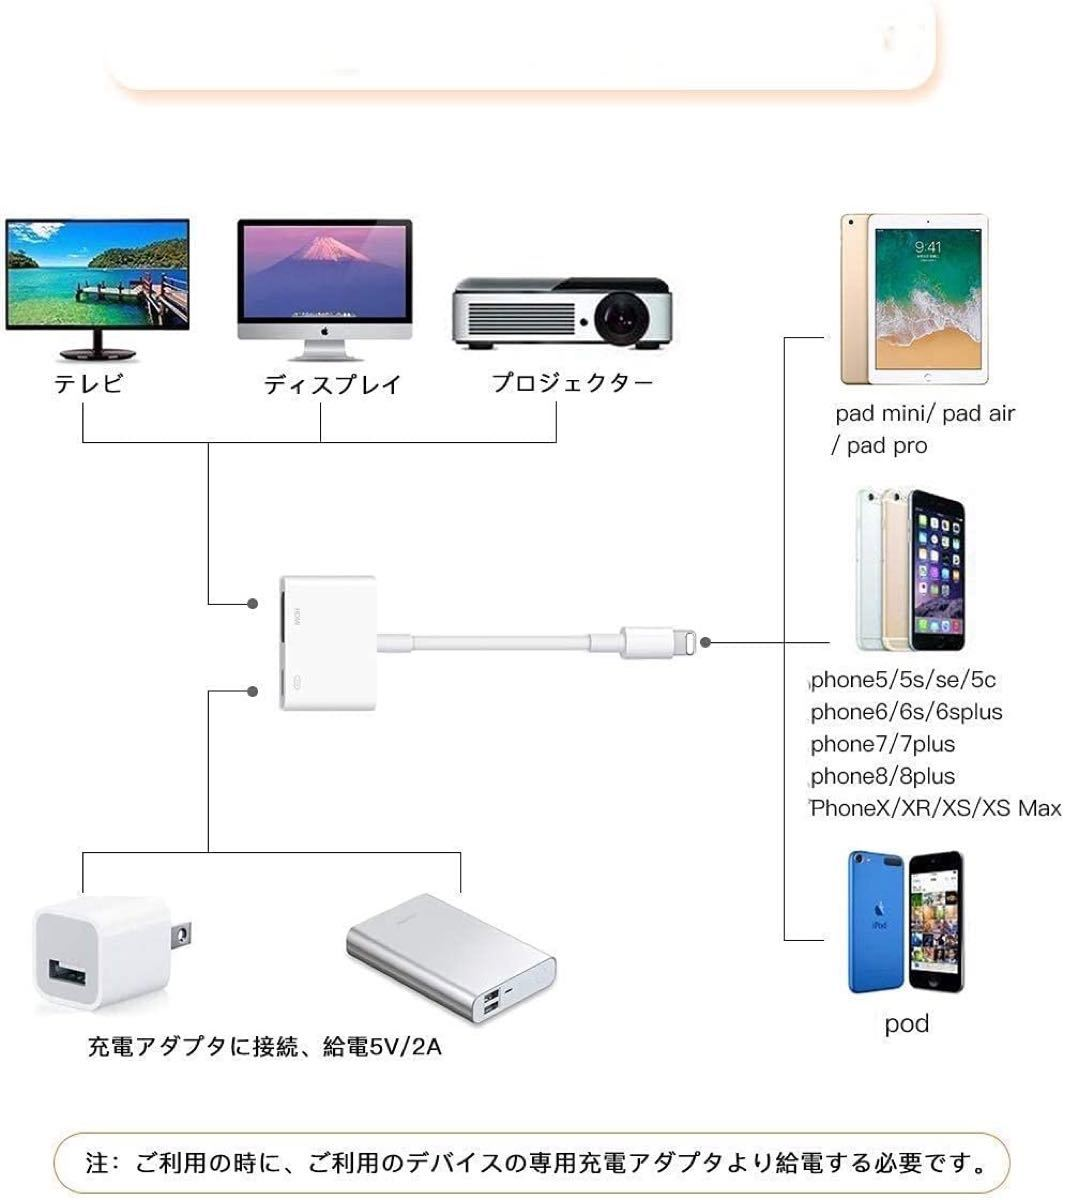 HDMI アダプター ipad/iphone HDMI変換アダプタ 大画面 1080P高画質 ゲーム遅延なし